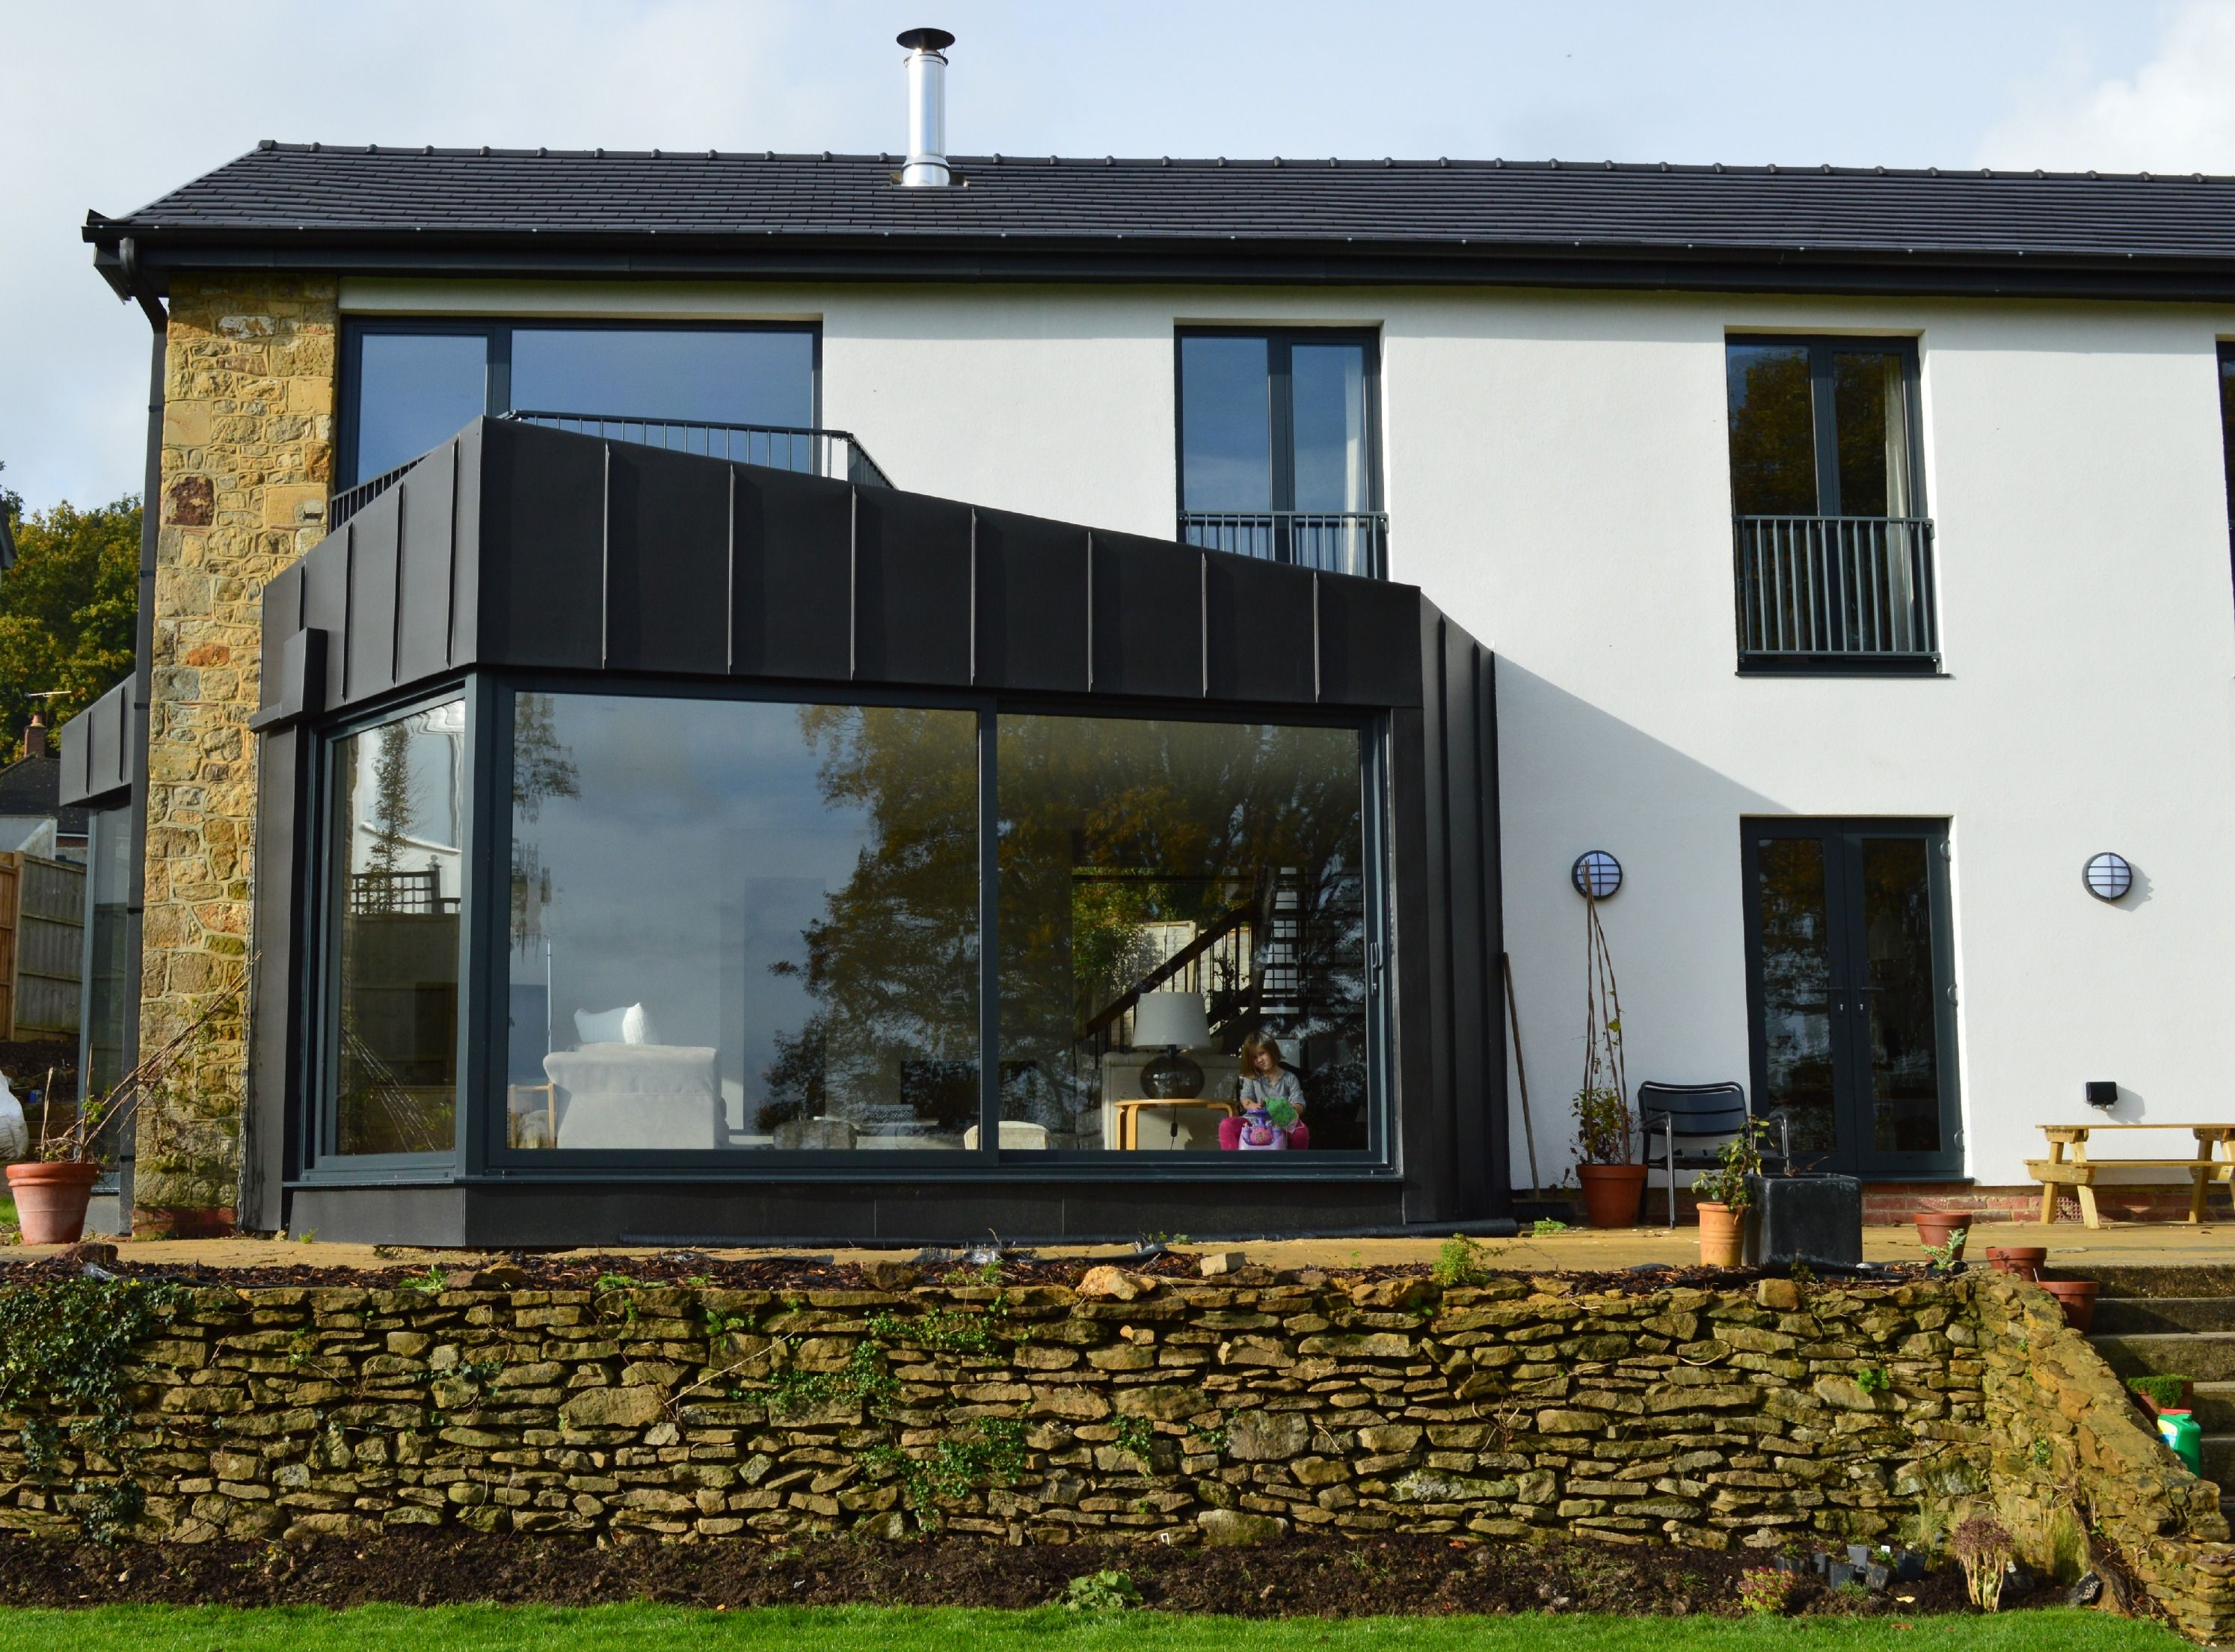 Bay window design exterior  zincclad extension to the living room  designextend  pinterest